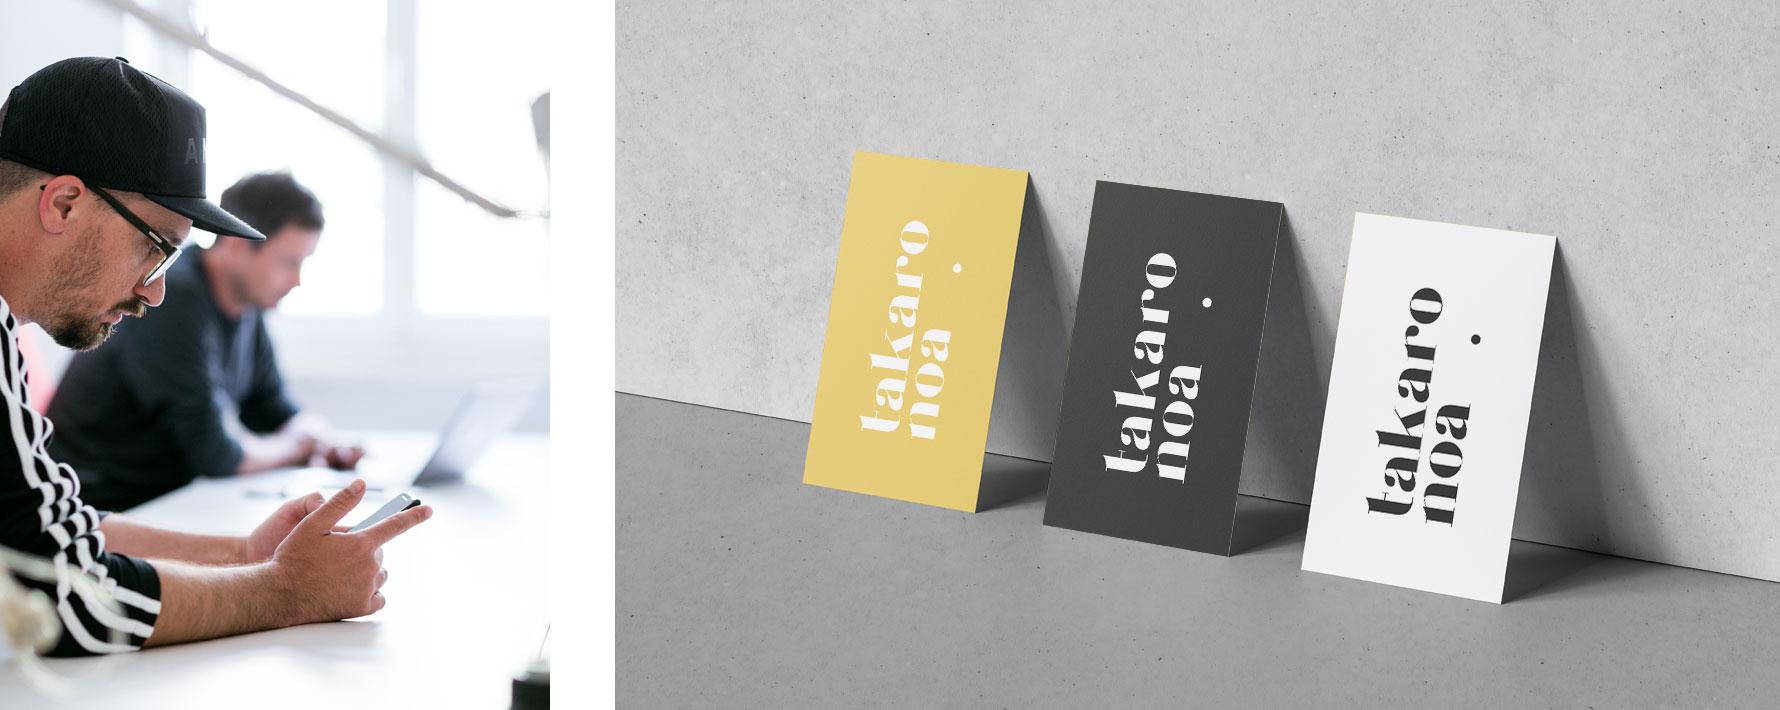 Hüfner Design | Referenz takaro noa | Corporate Design